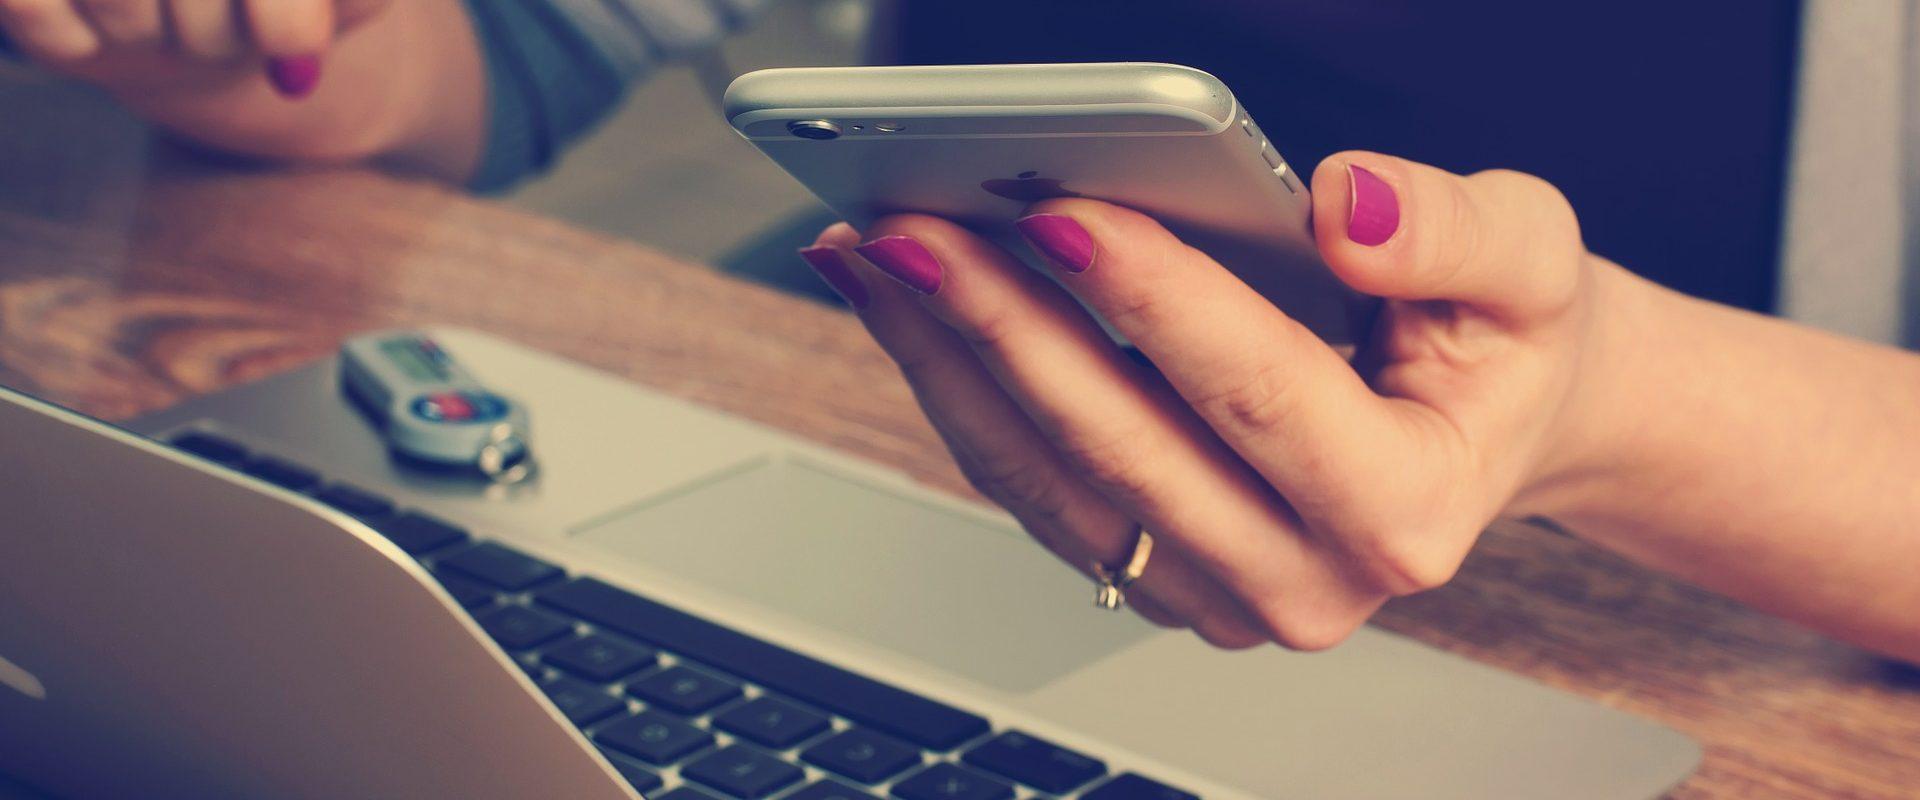 información sobre Alzheimer en el móvil